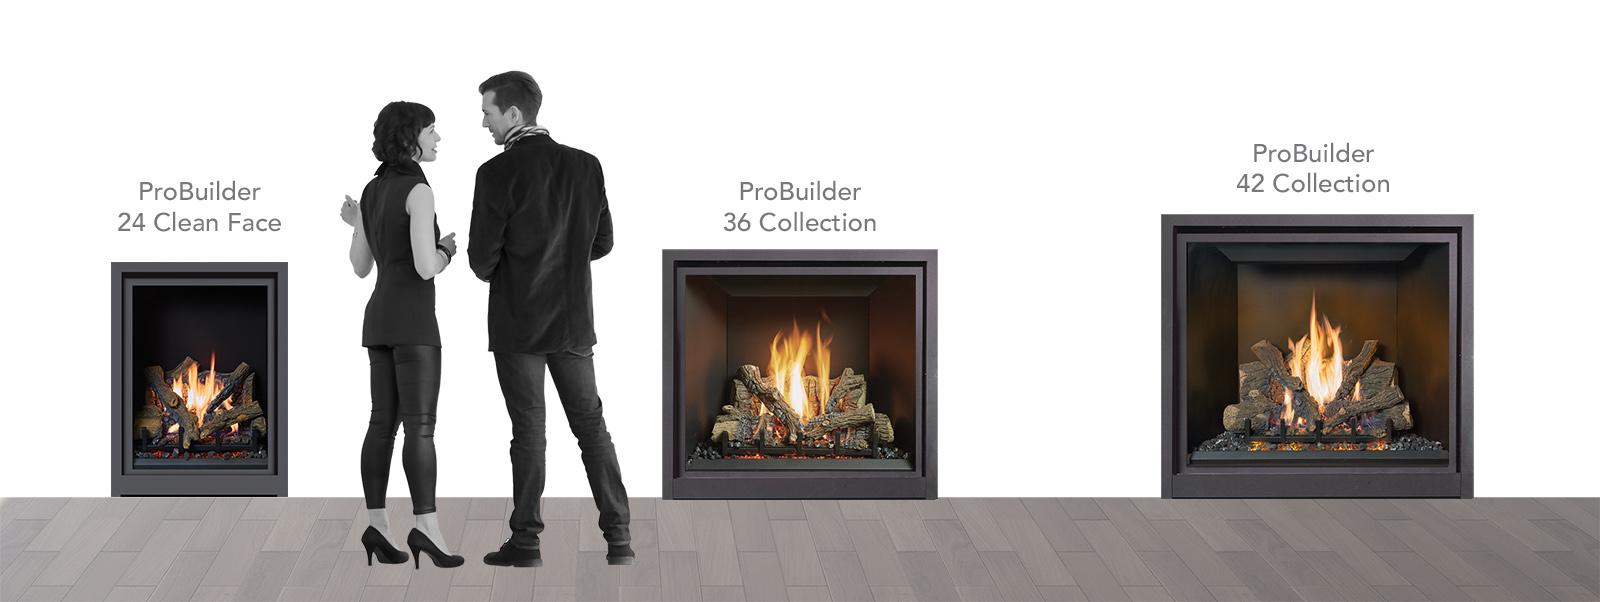 TraditionalProBuilder_GasFP_Comp_New